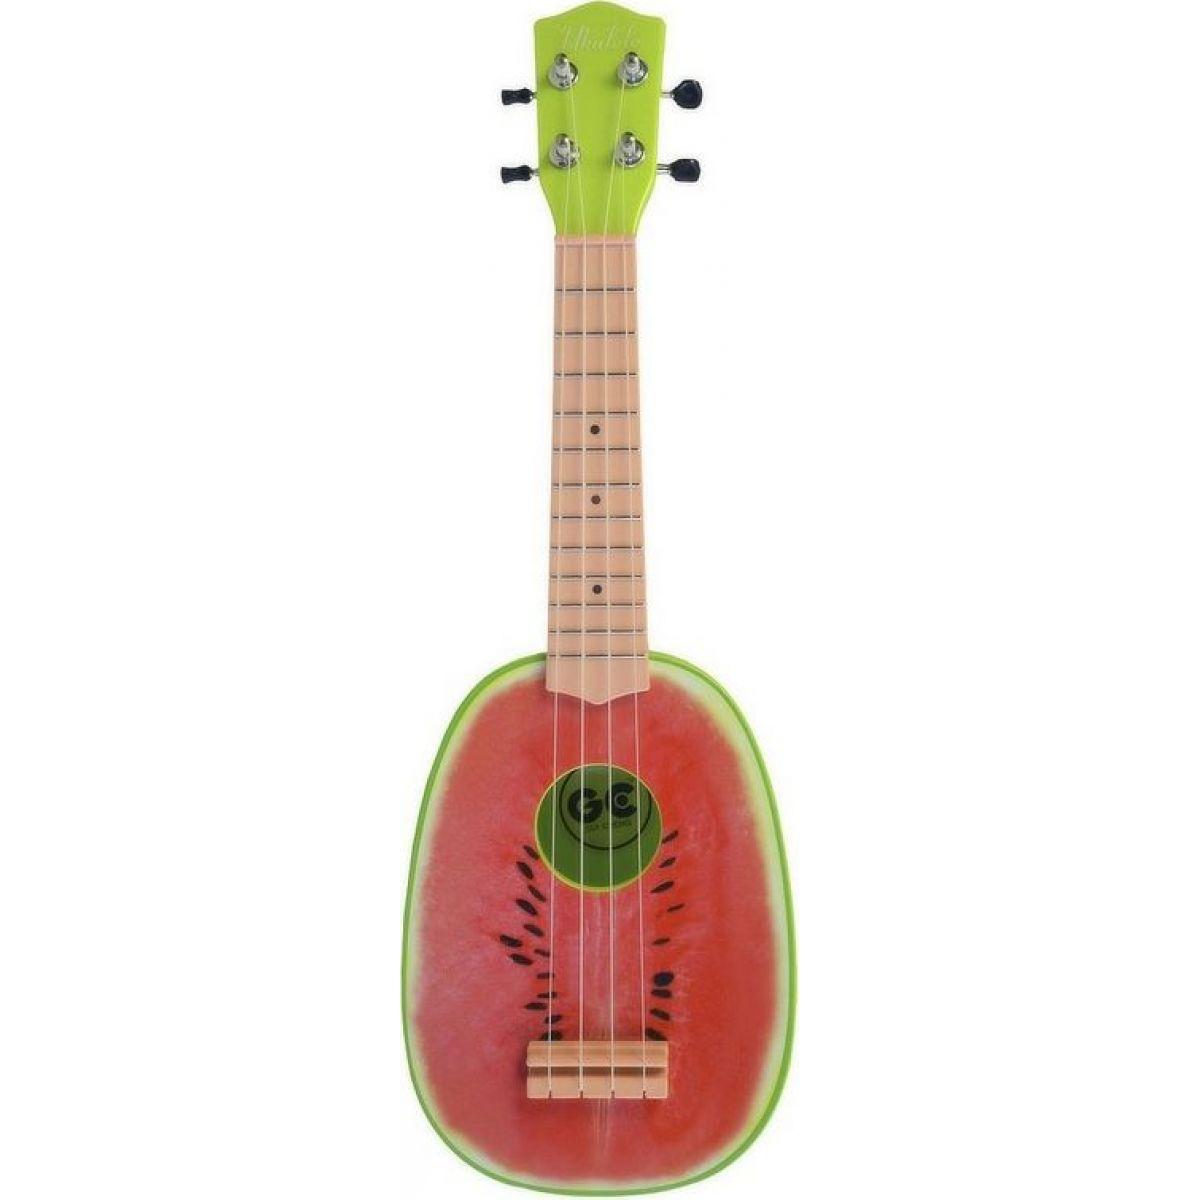 Kytara 54cm meloun